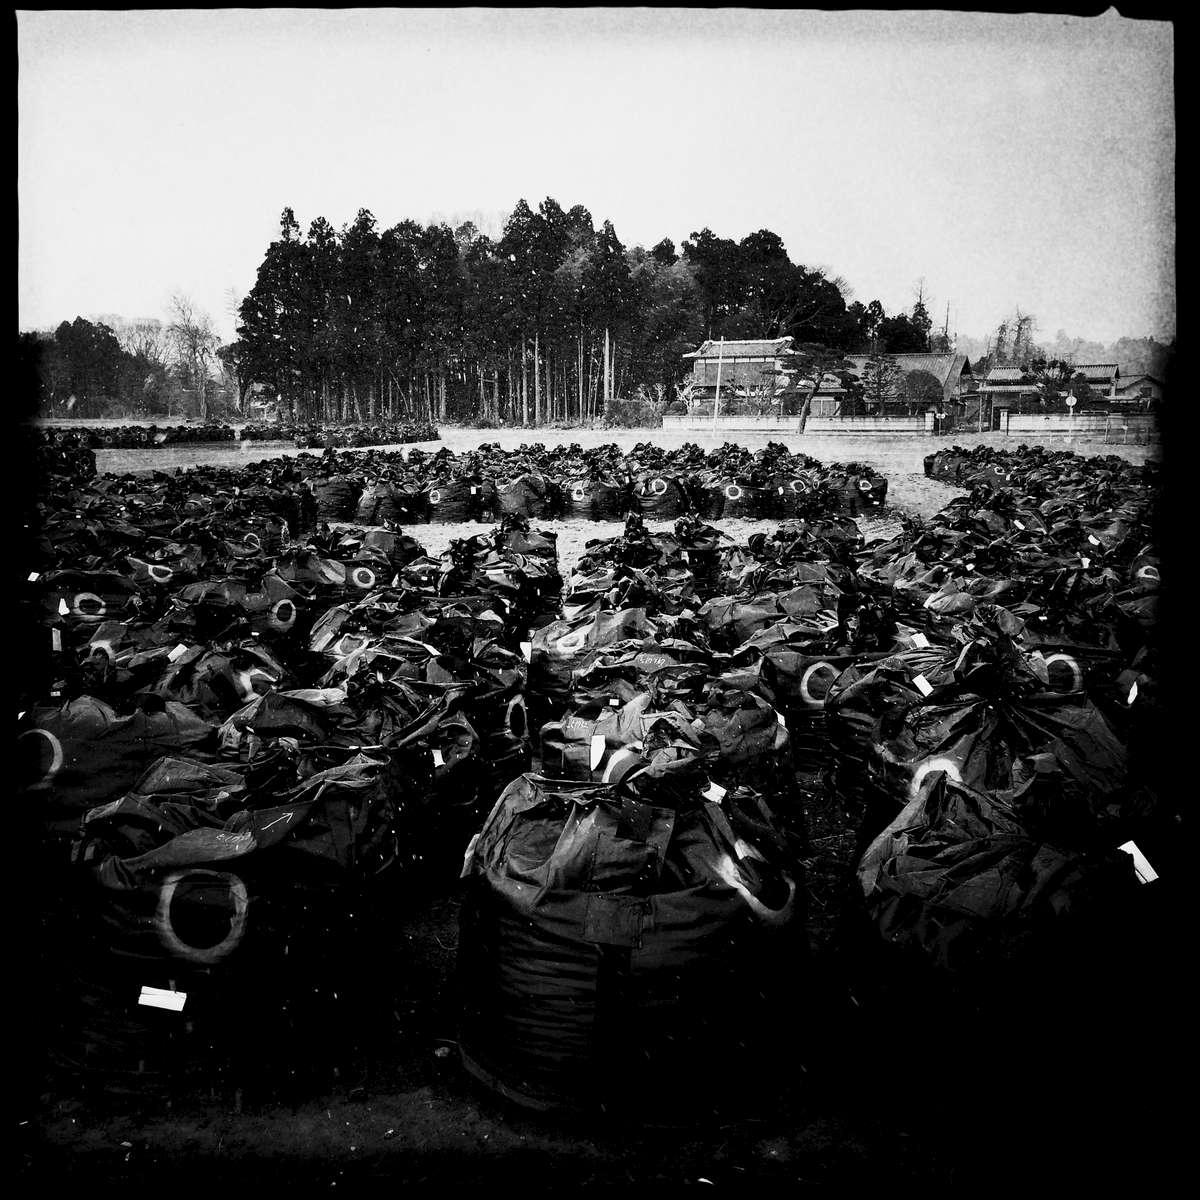 Bags of radiation contaminated soil. Mar/ 2014, Naraha, Minami-Soma.